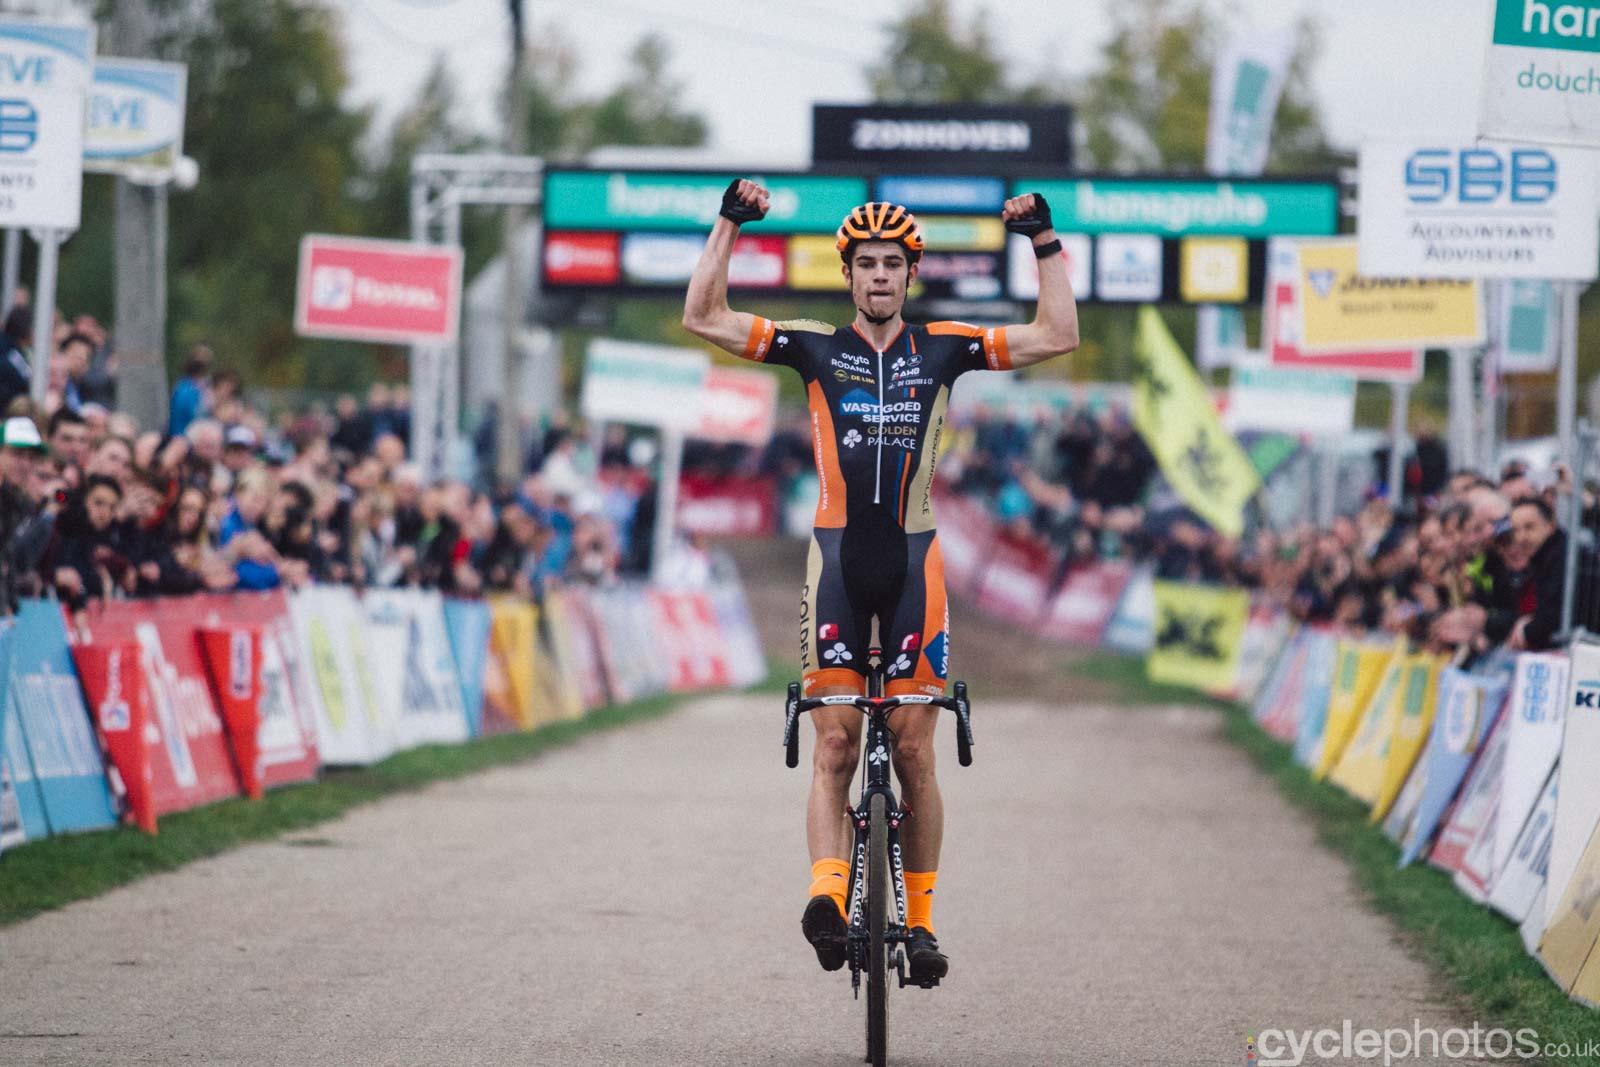 2015-cyclephotos-cyclocross-zonhoven-170113-wout-van-aert